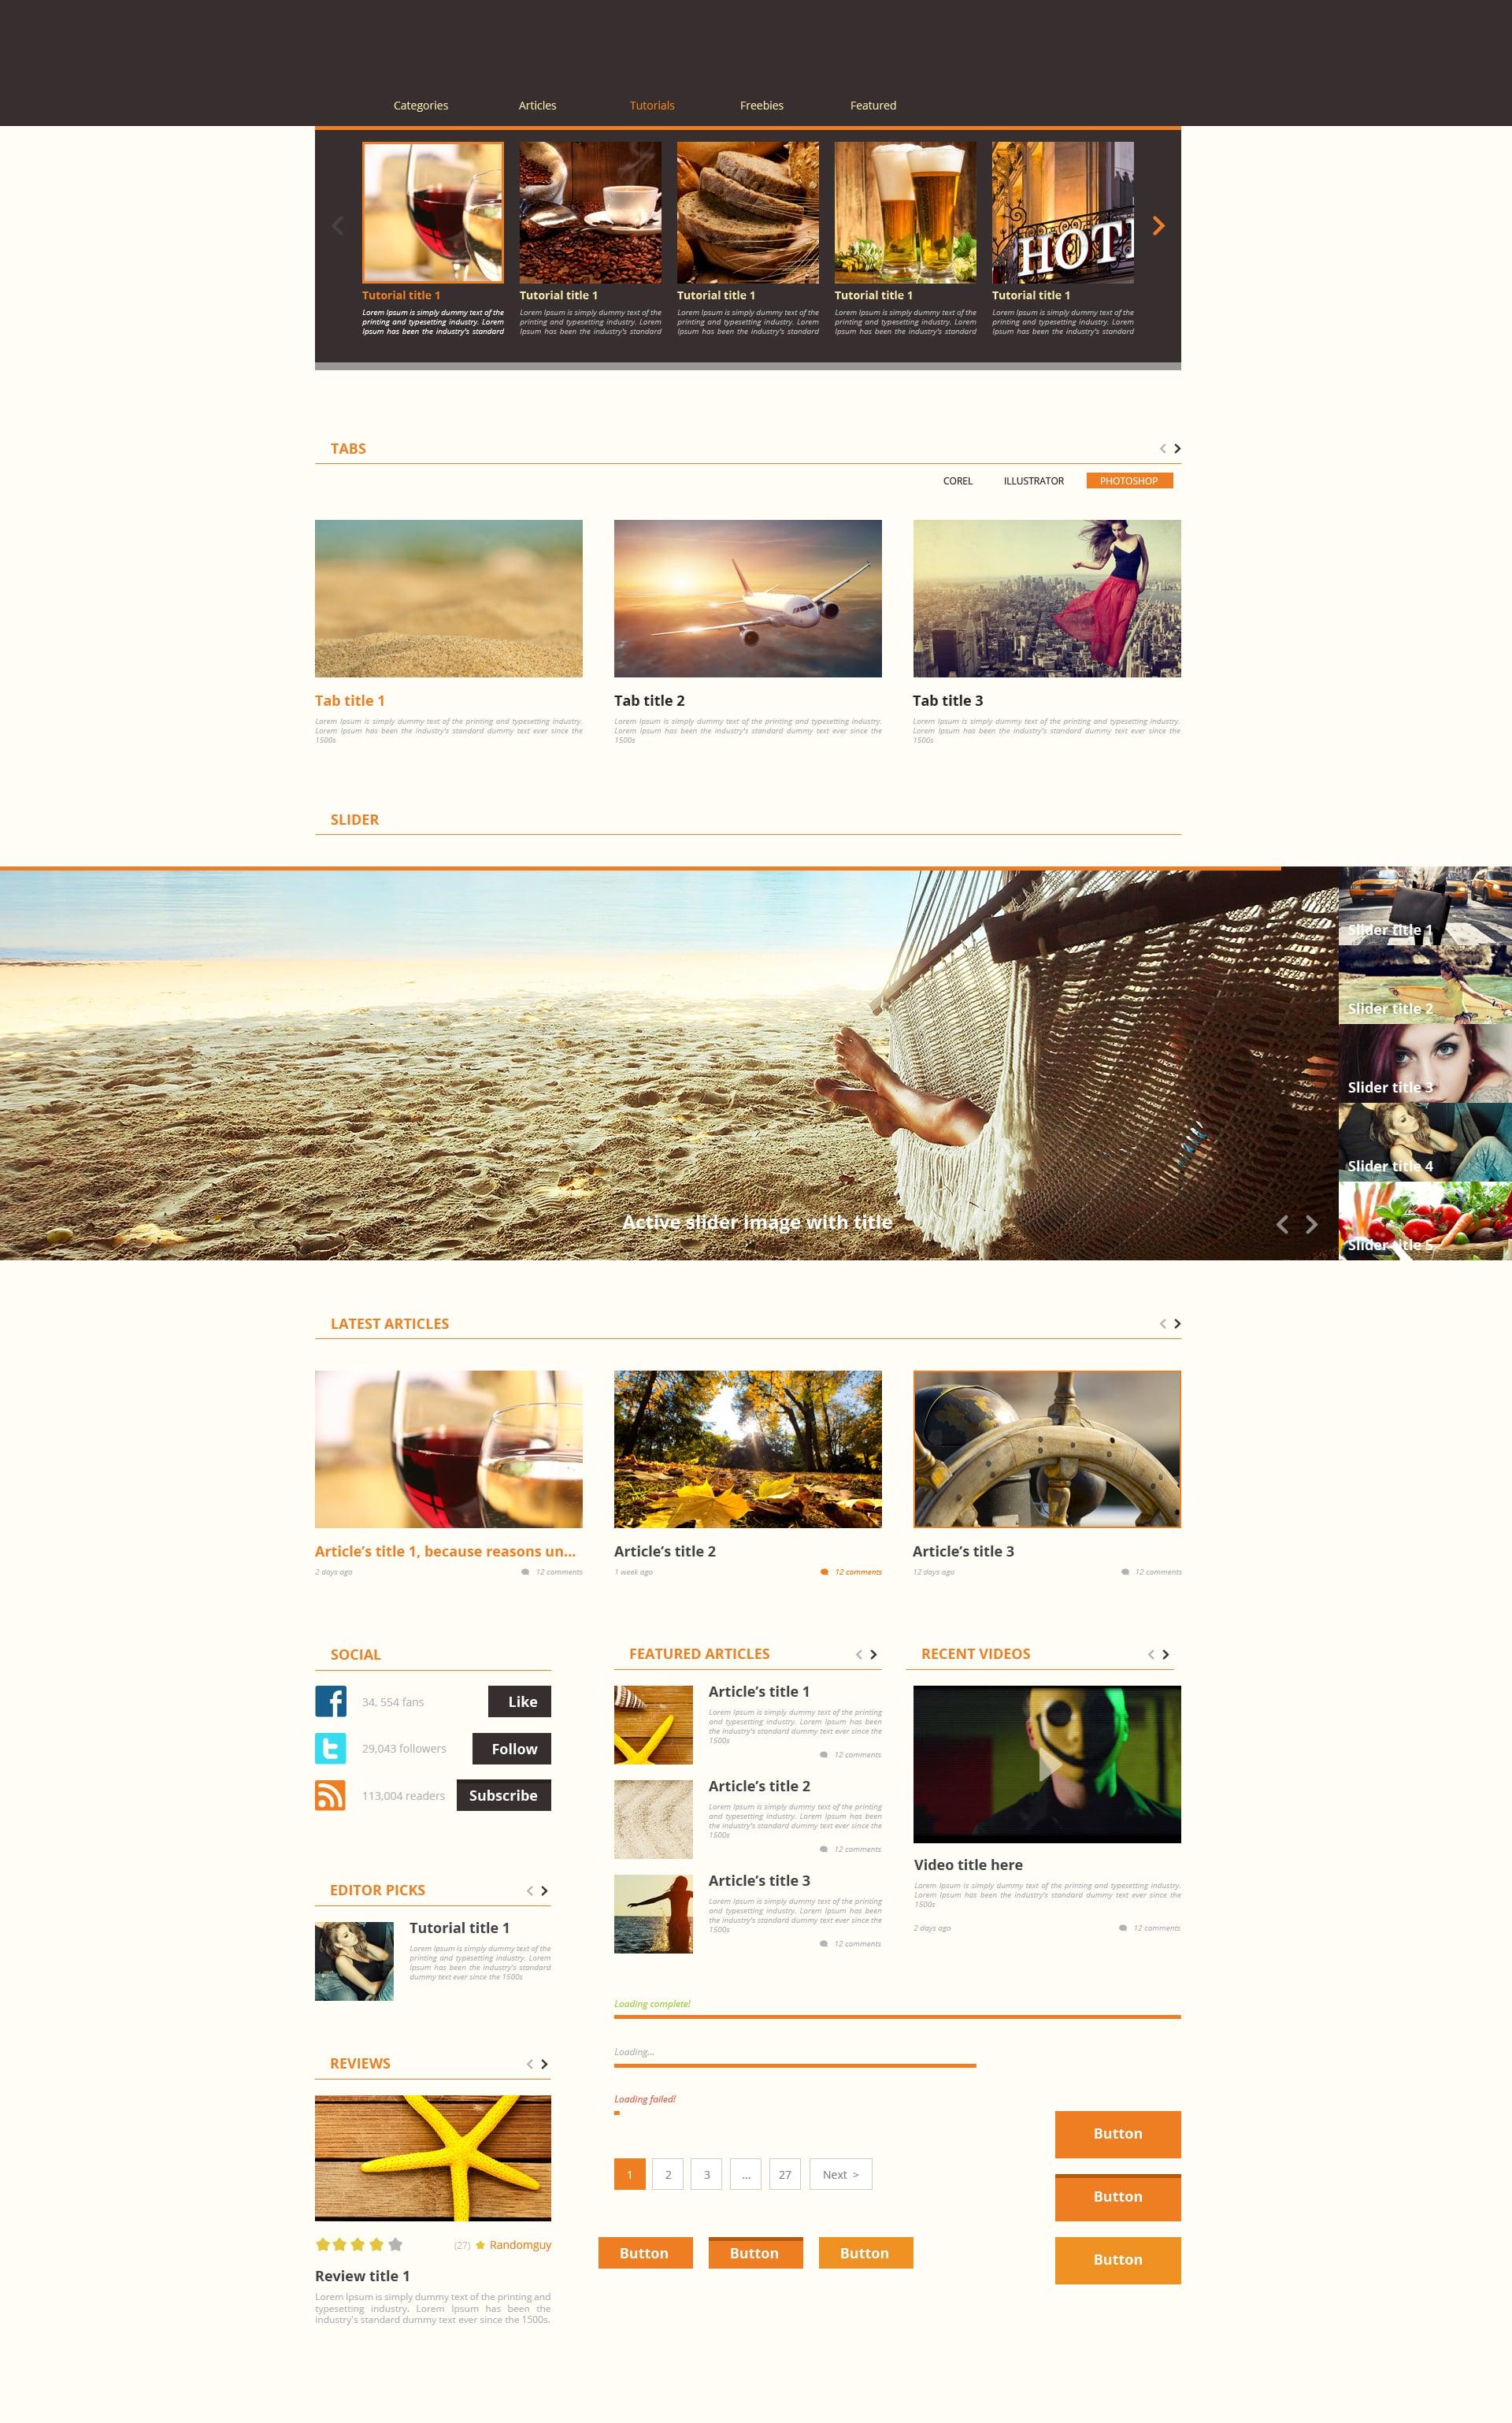 The Web Design Mega Set – Hundreds of Premium Resources for Only $19 - designtnt web uNews